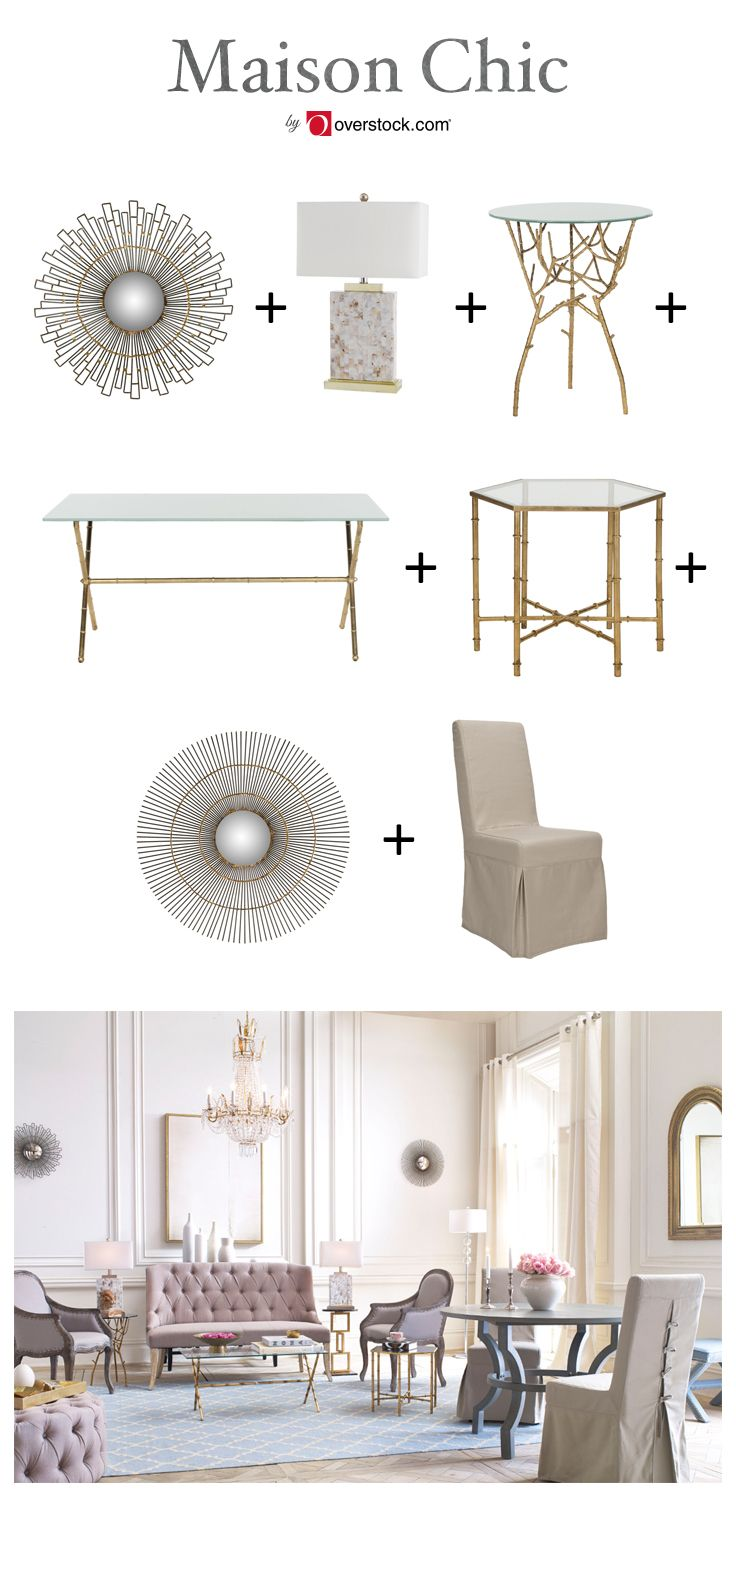 183 best Living Room images on Pinterest | At home, Calendar ...